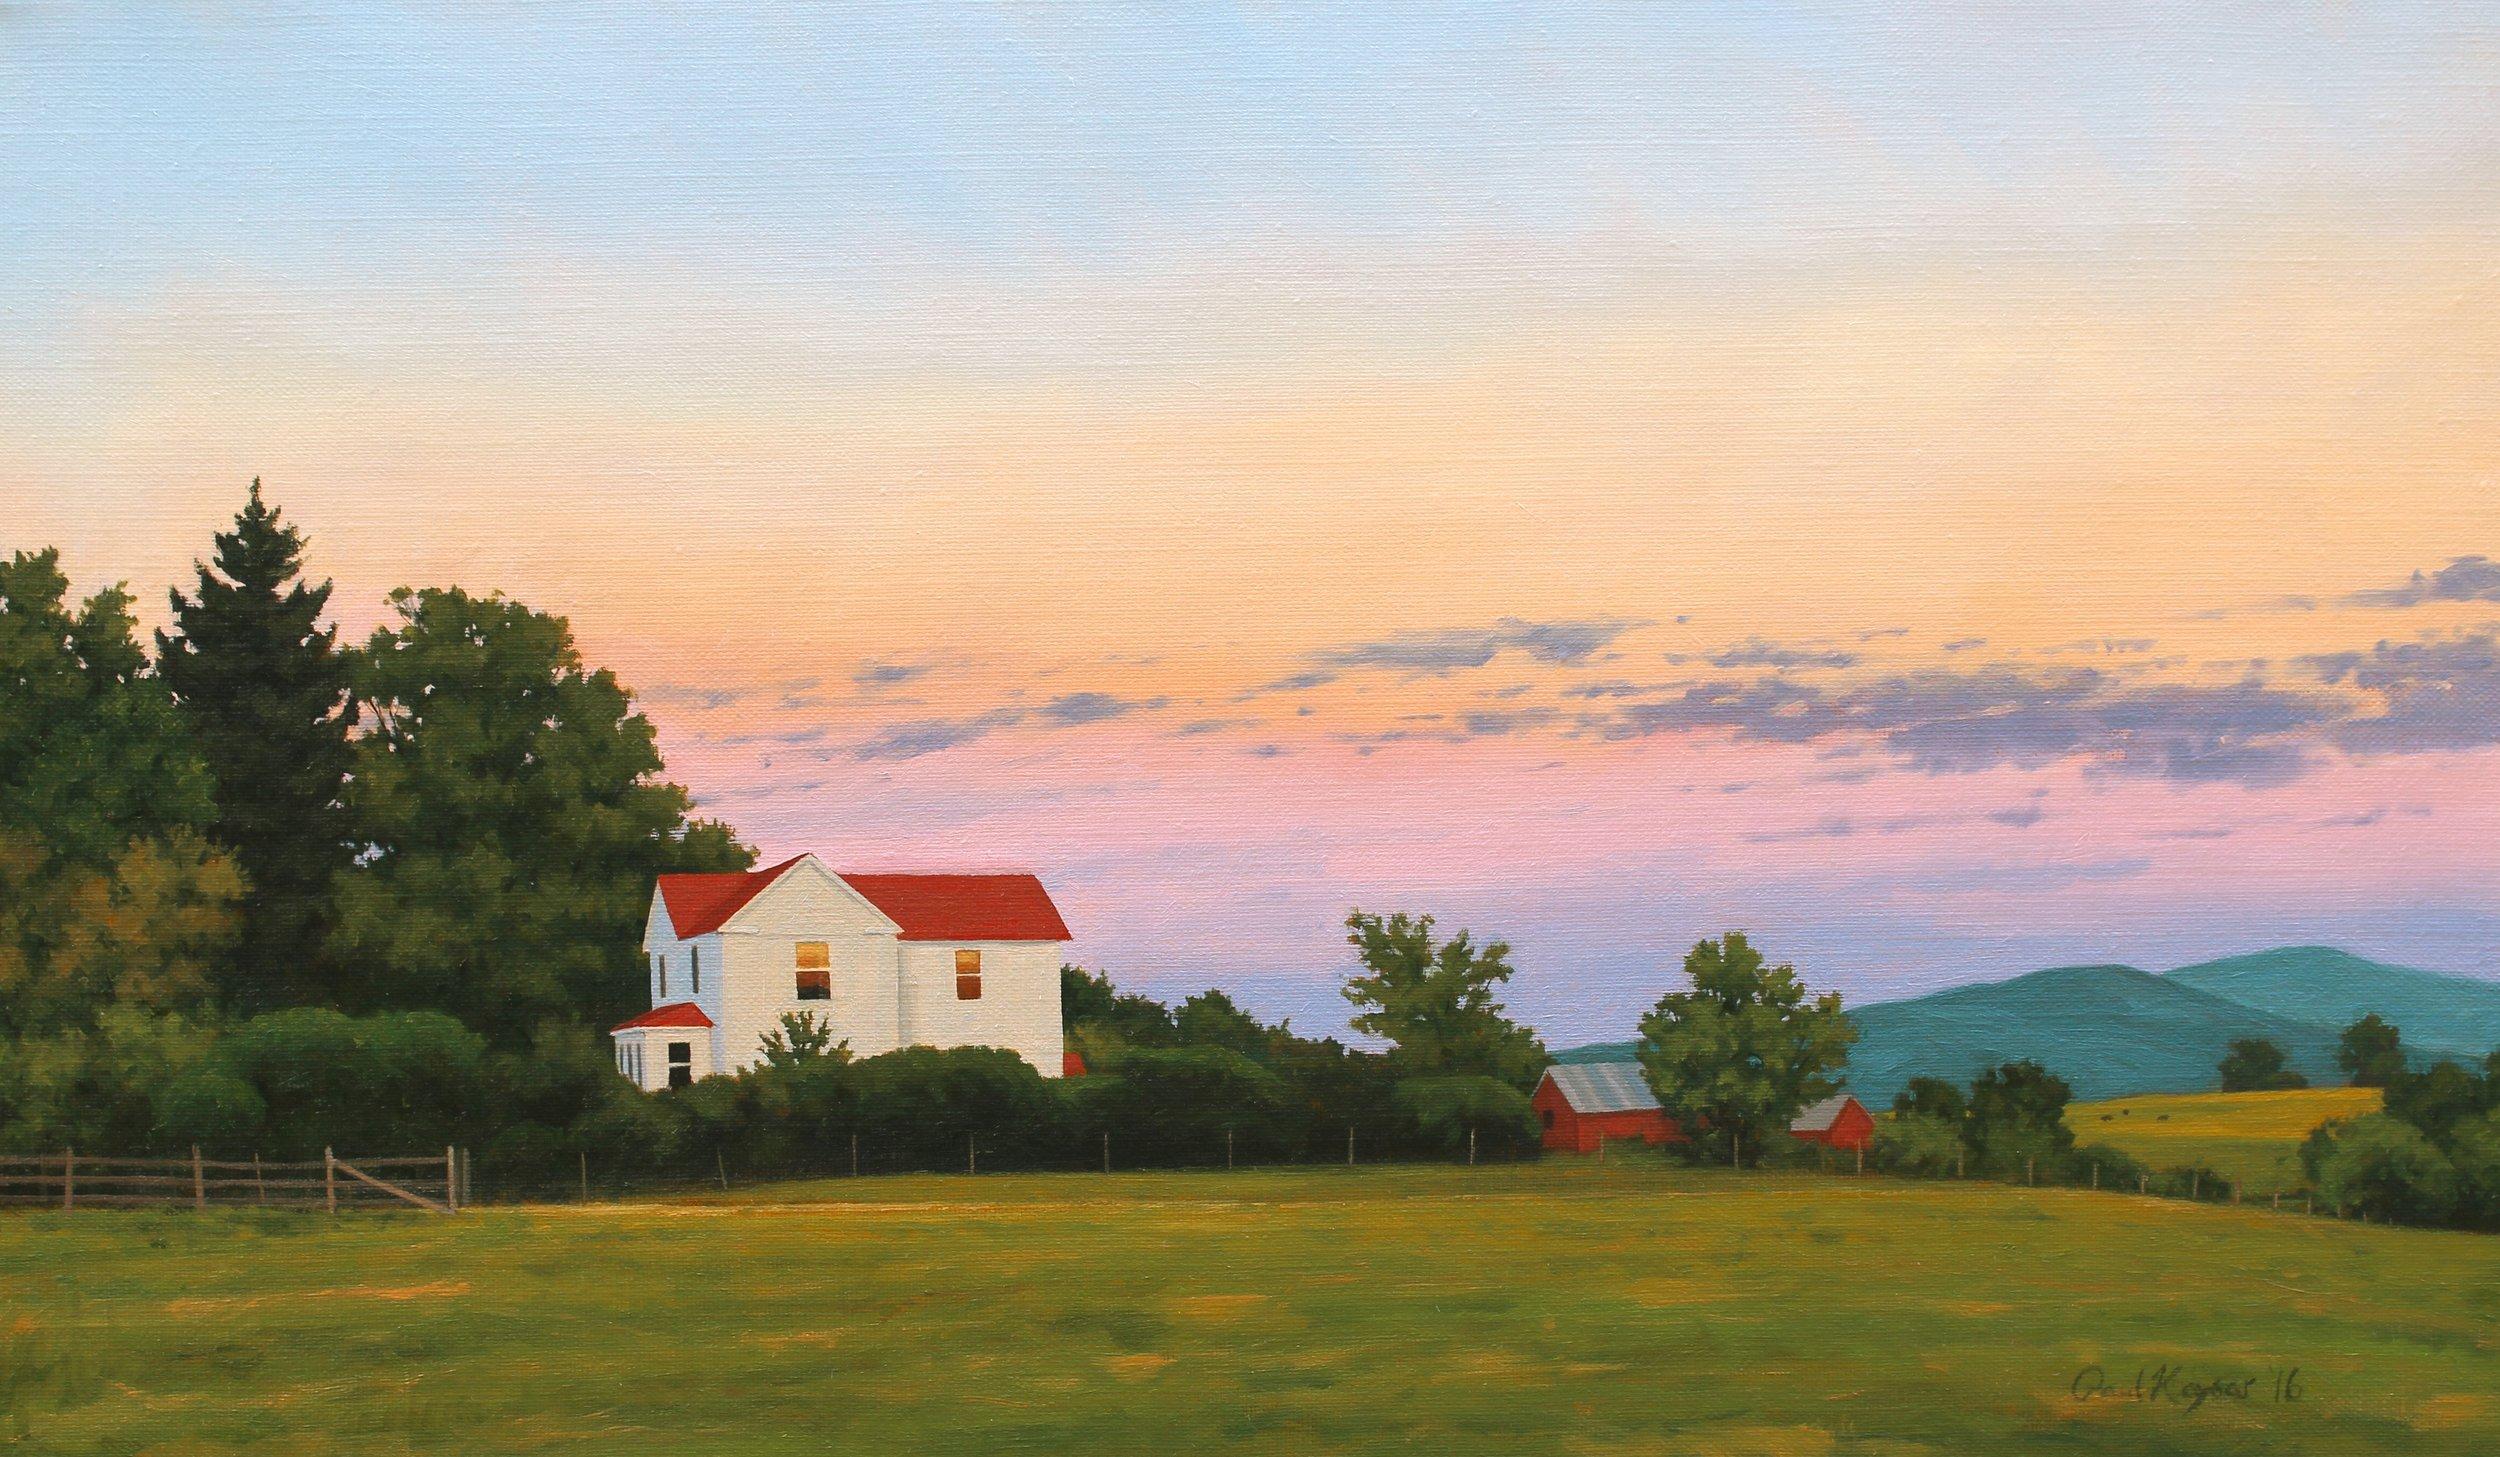 """Farm House at Sunset"" 12x20"" oil on linen"